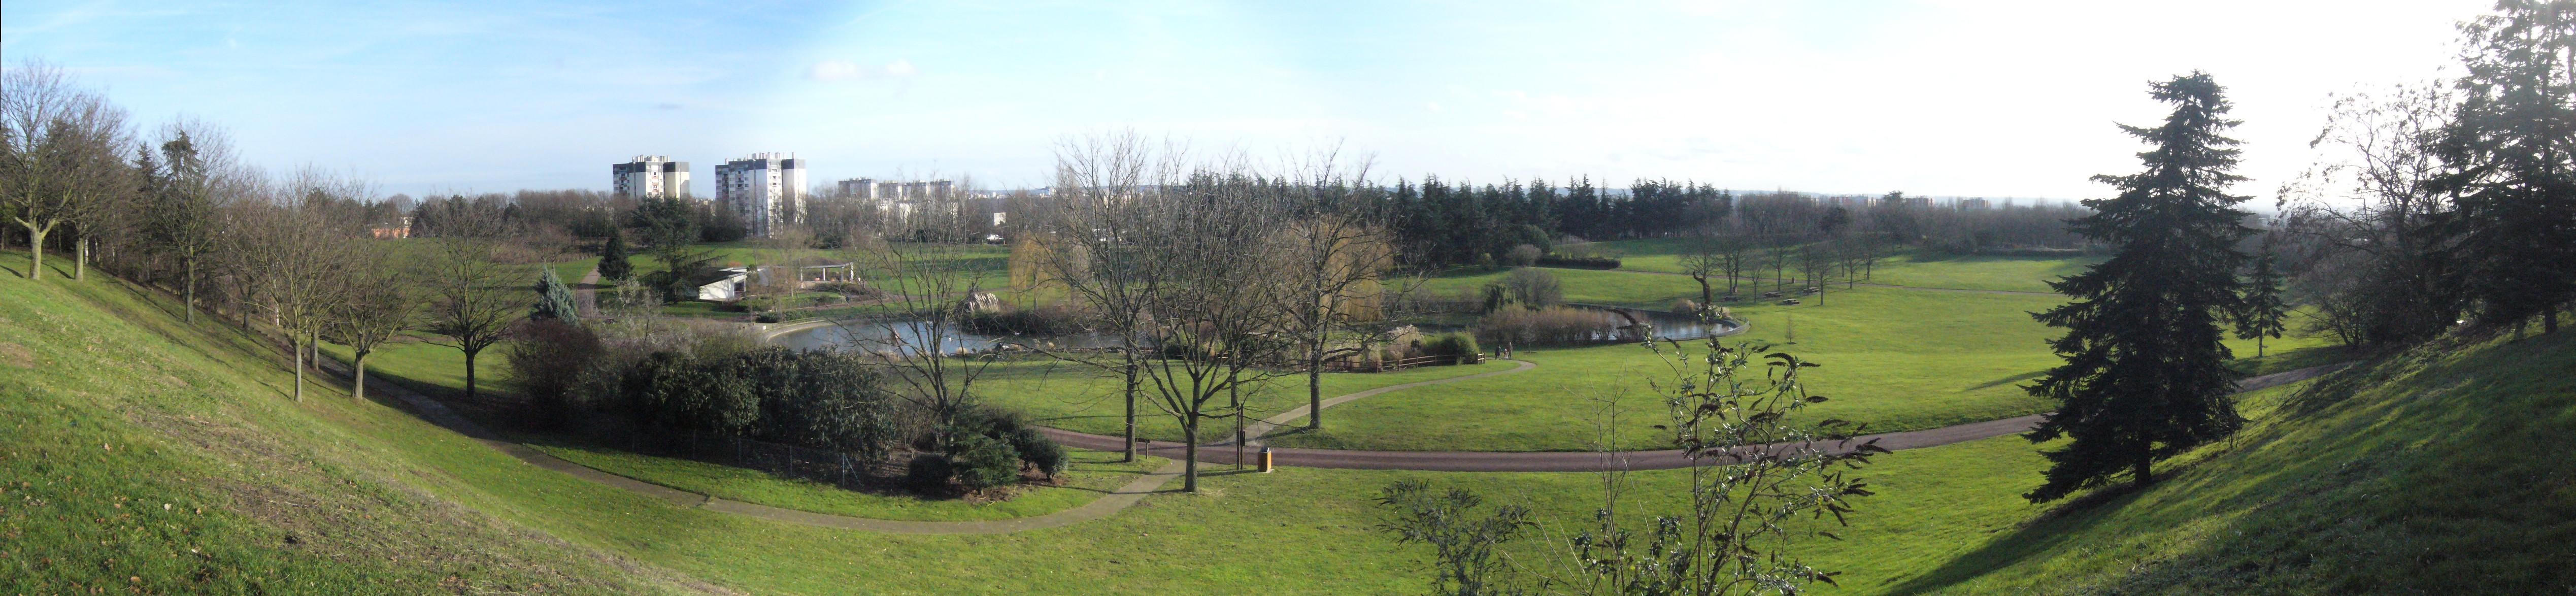 Aulnay sous Bois # Hopital Robert Ballanger Aulnay Sous Bois